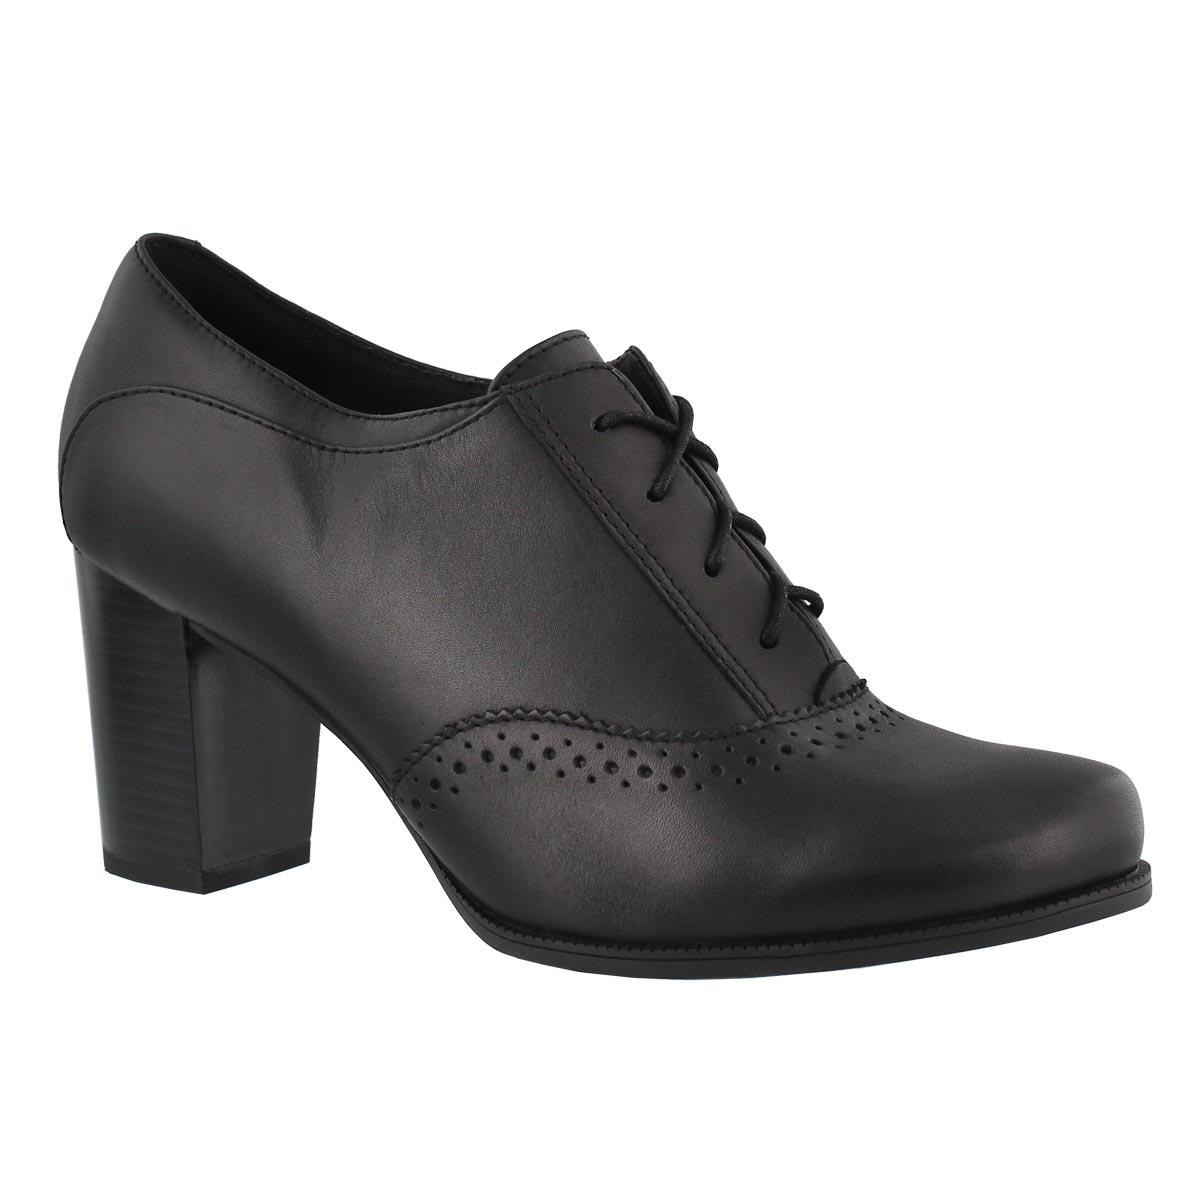 Lds Claeson Pearl black dress heel